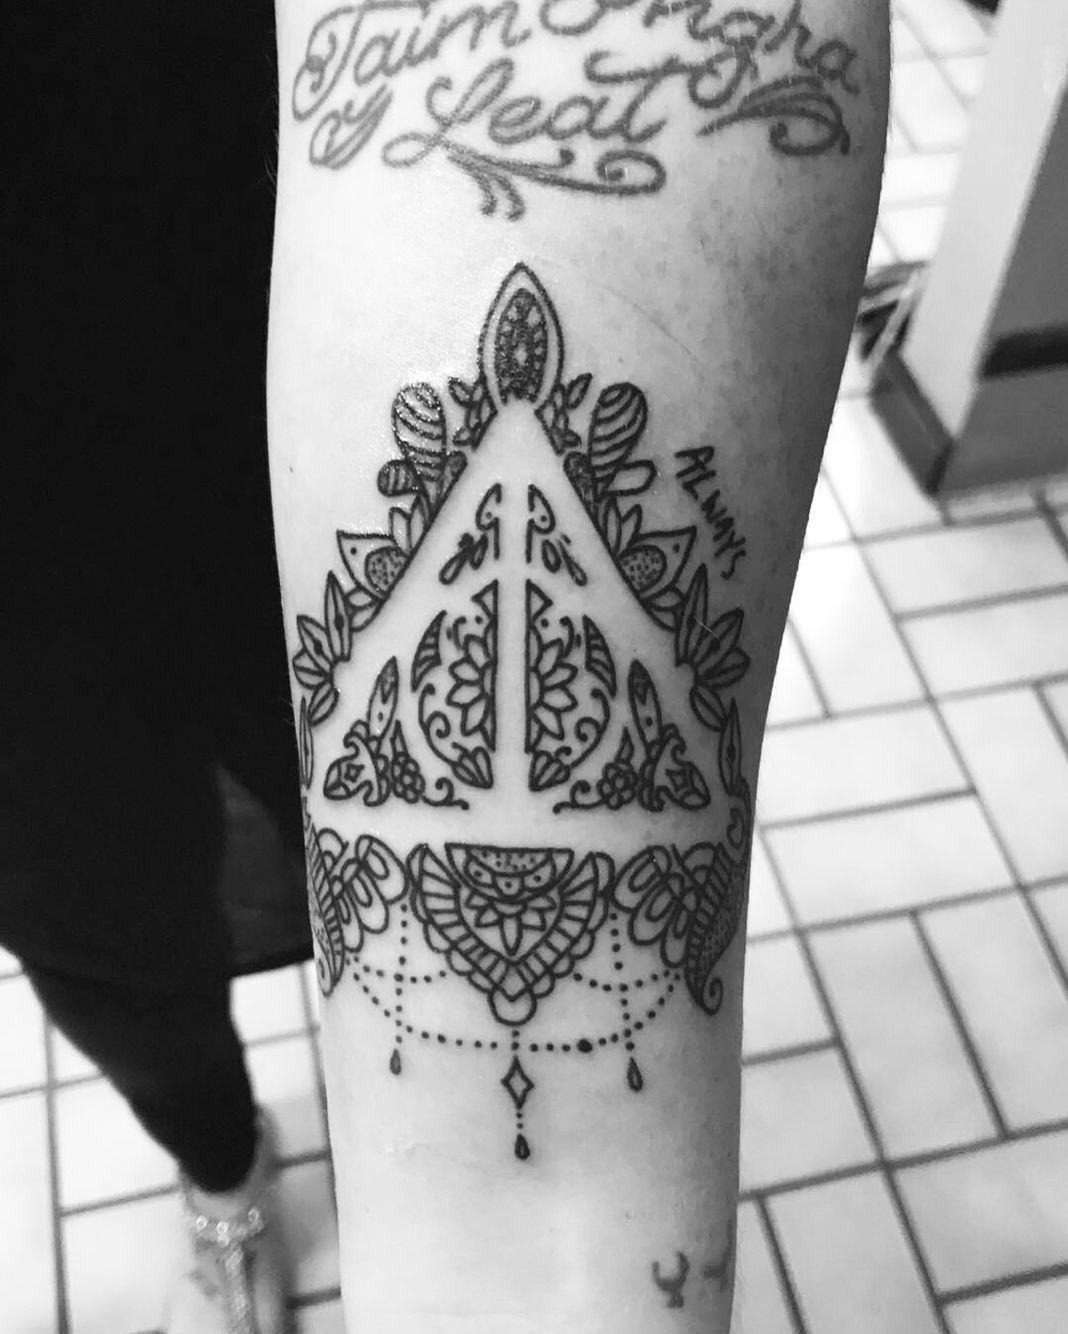 b926e143d Harry Potter tattoo. Deathly hallows. Always. Mandala. Forearm tattoo.